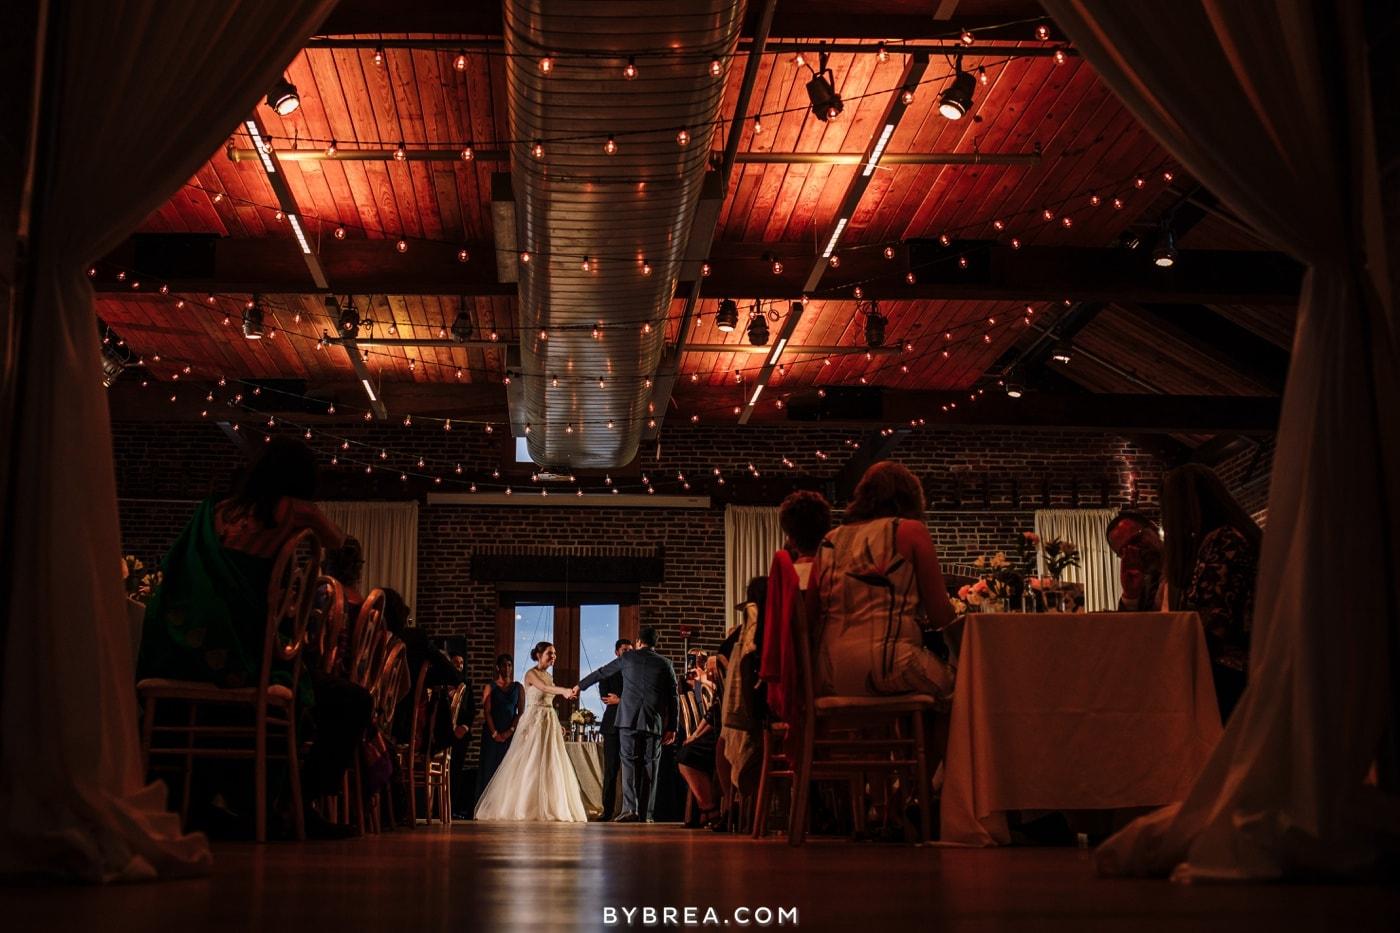 tracy-bharath-frederick-douglass-baltimore-wedding-photos_0300